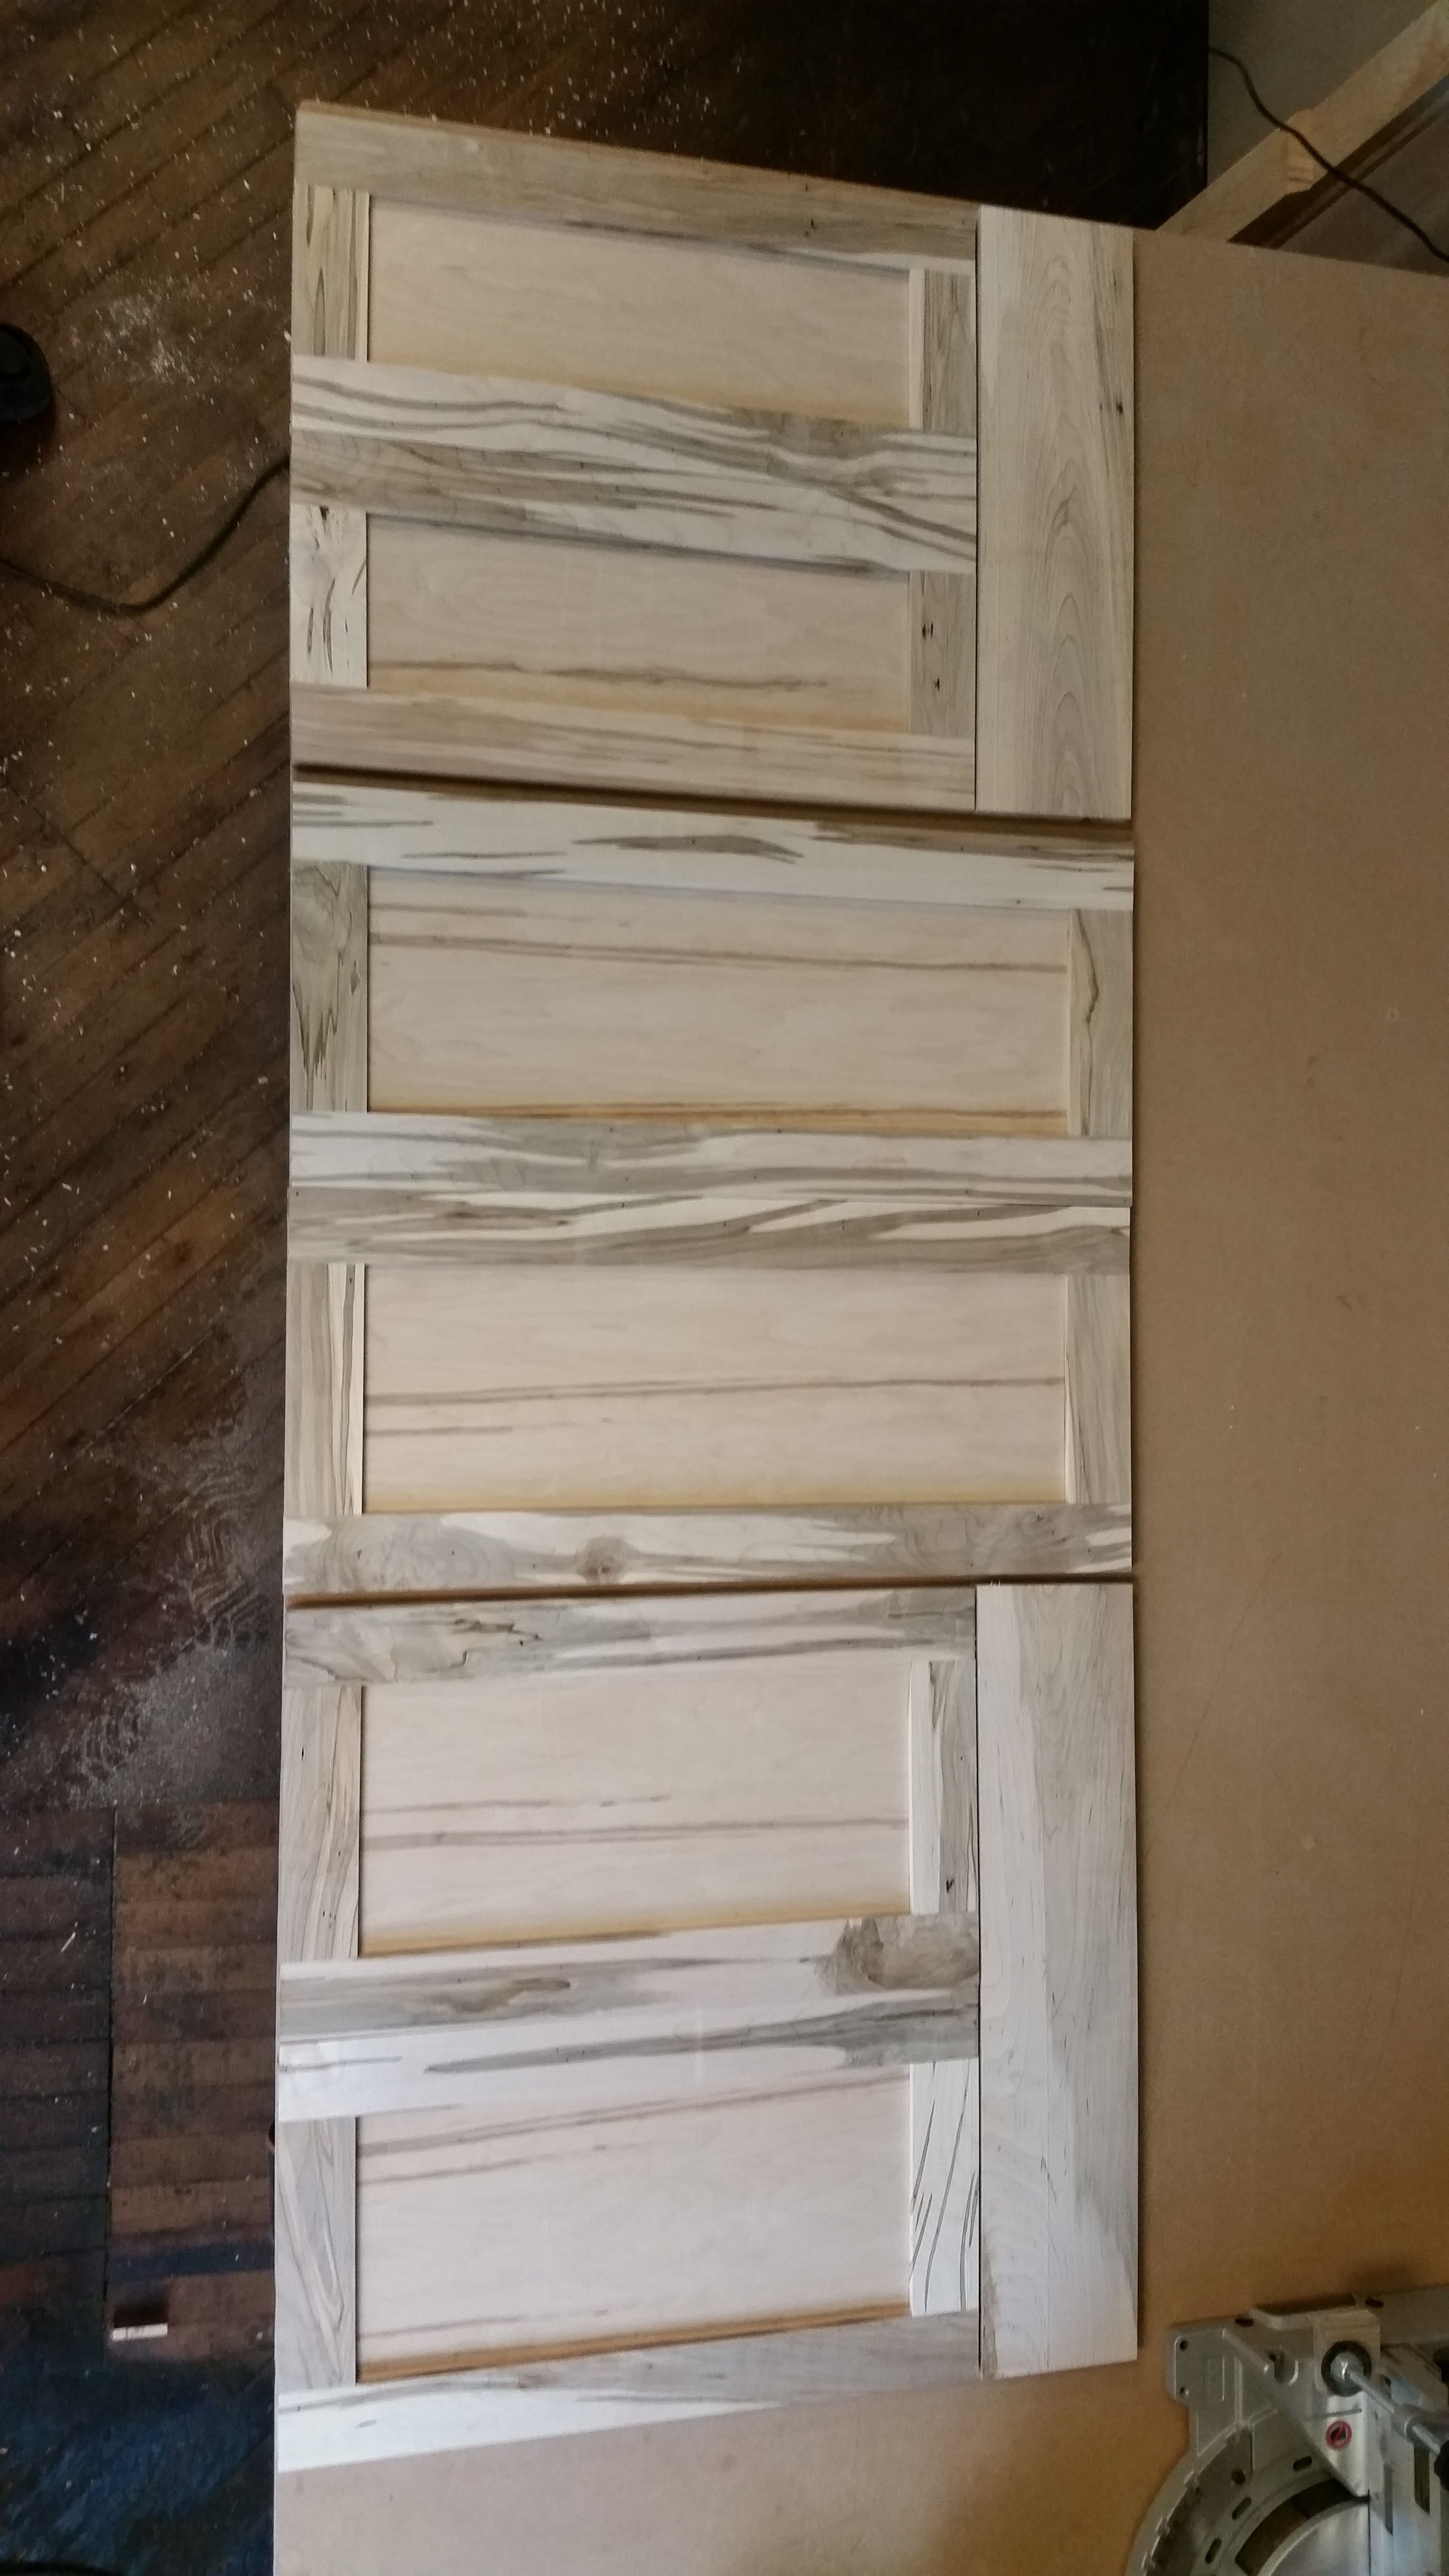 Wormy Maple Doors Custom Woodworking Contemporary Modern Furniture Kitchen Cabinet Design